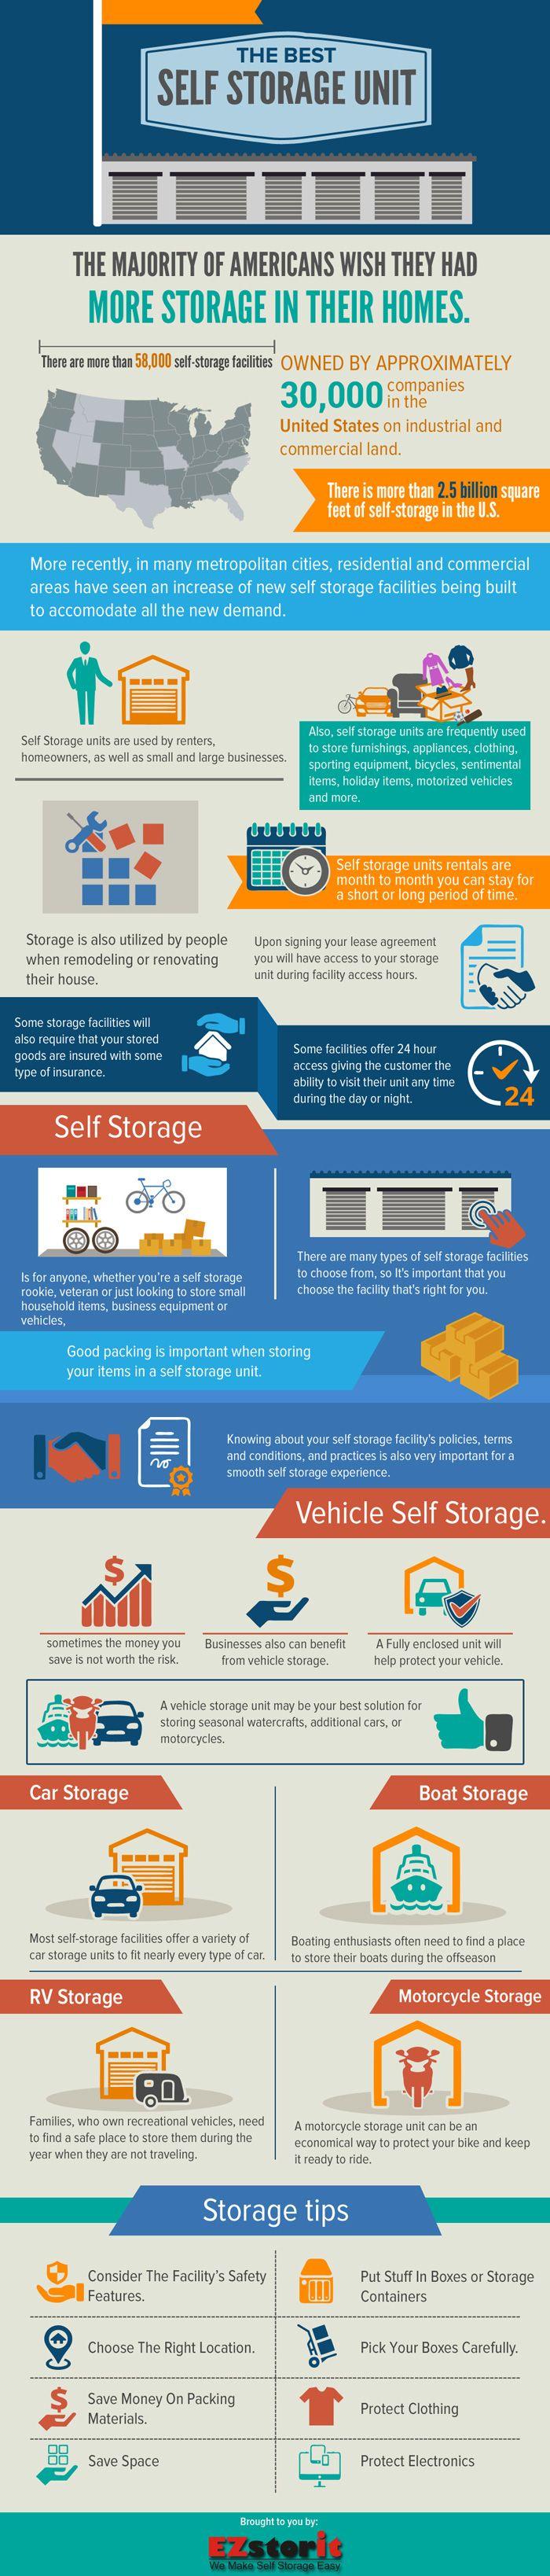 Self Storage Units In The US | EZstorit.com